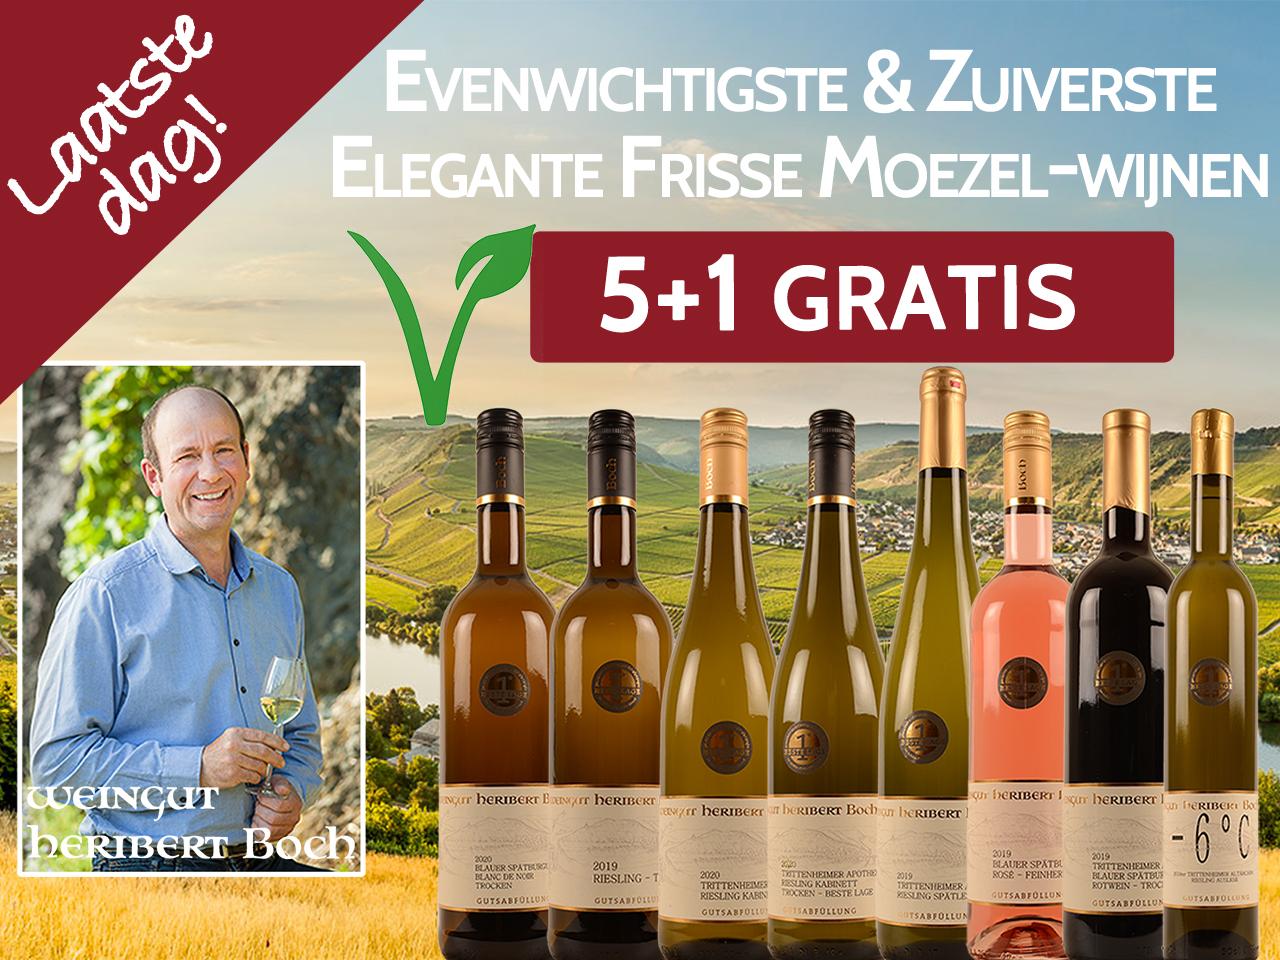 Weingut Boch promo 5+1 gratis